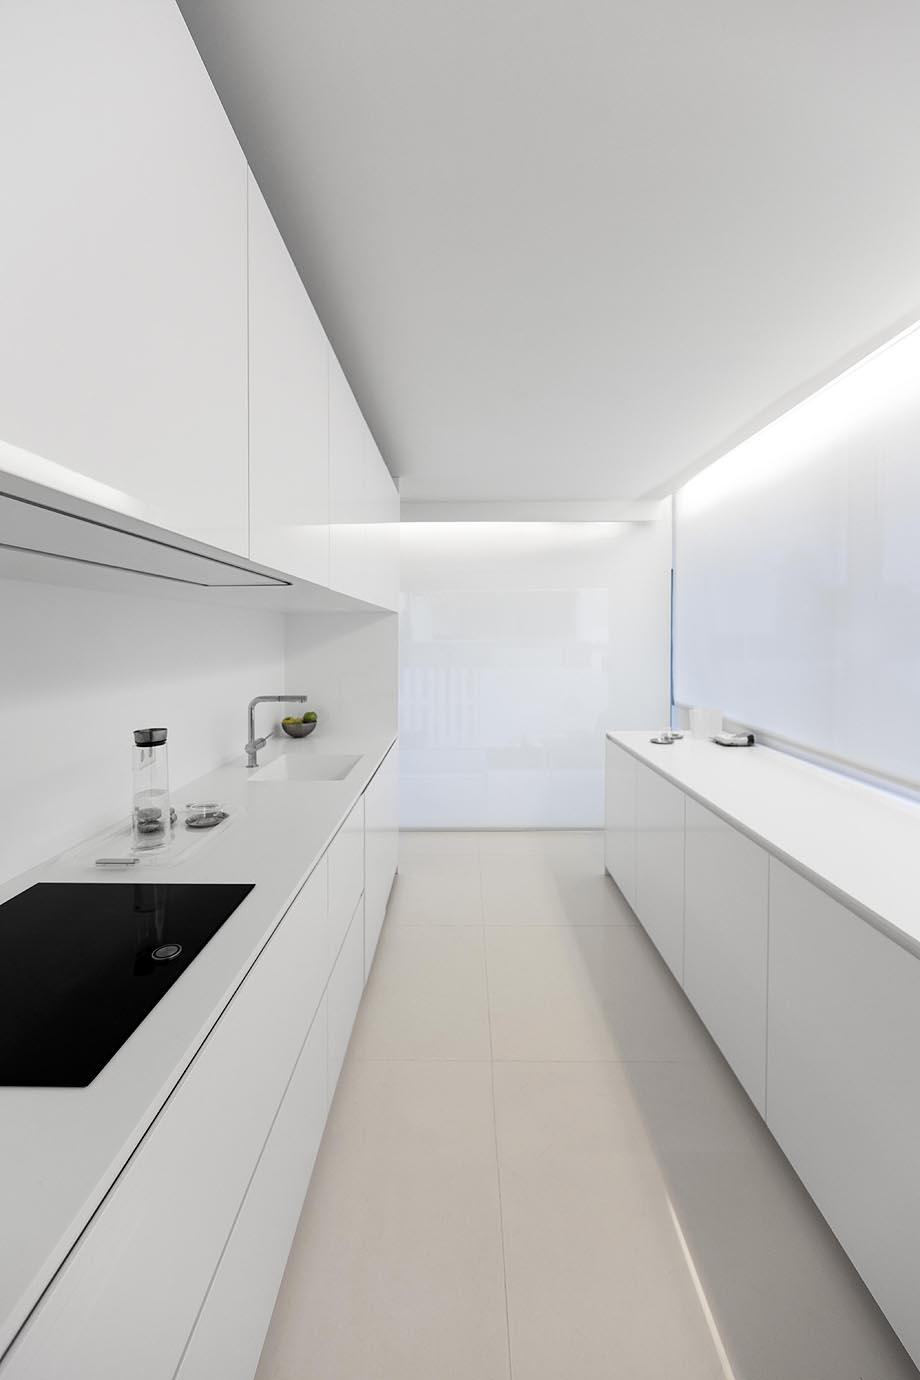 breeze house de fran silvestre arquitectos (11)